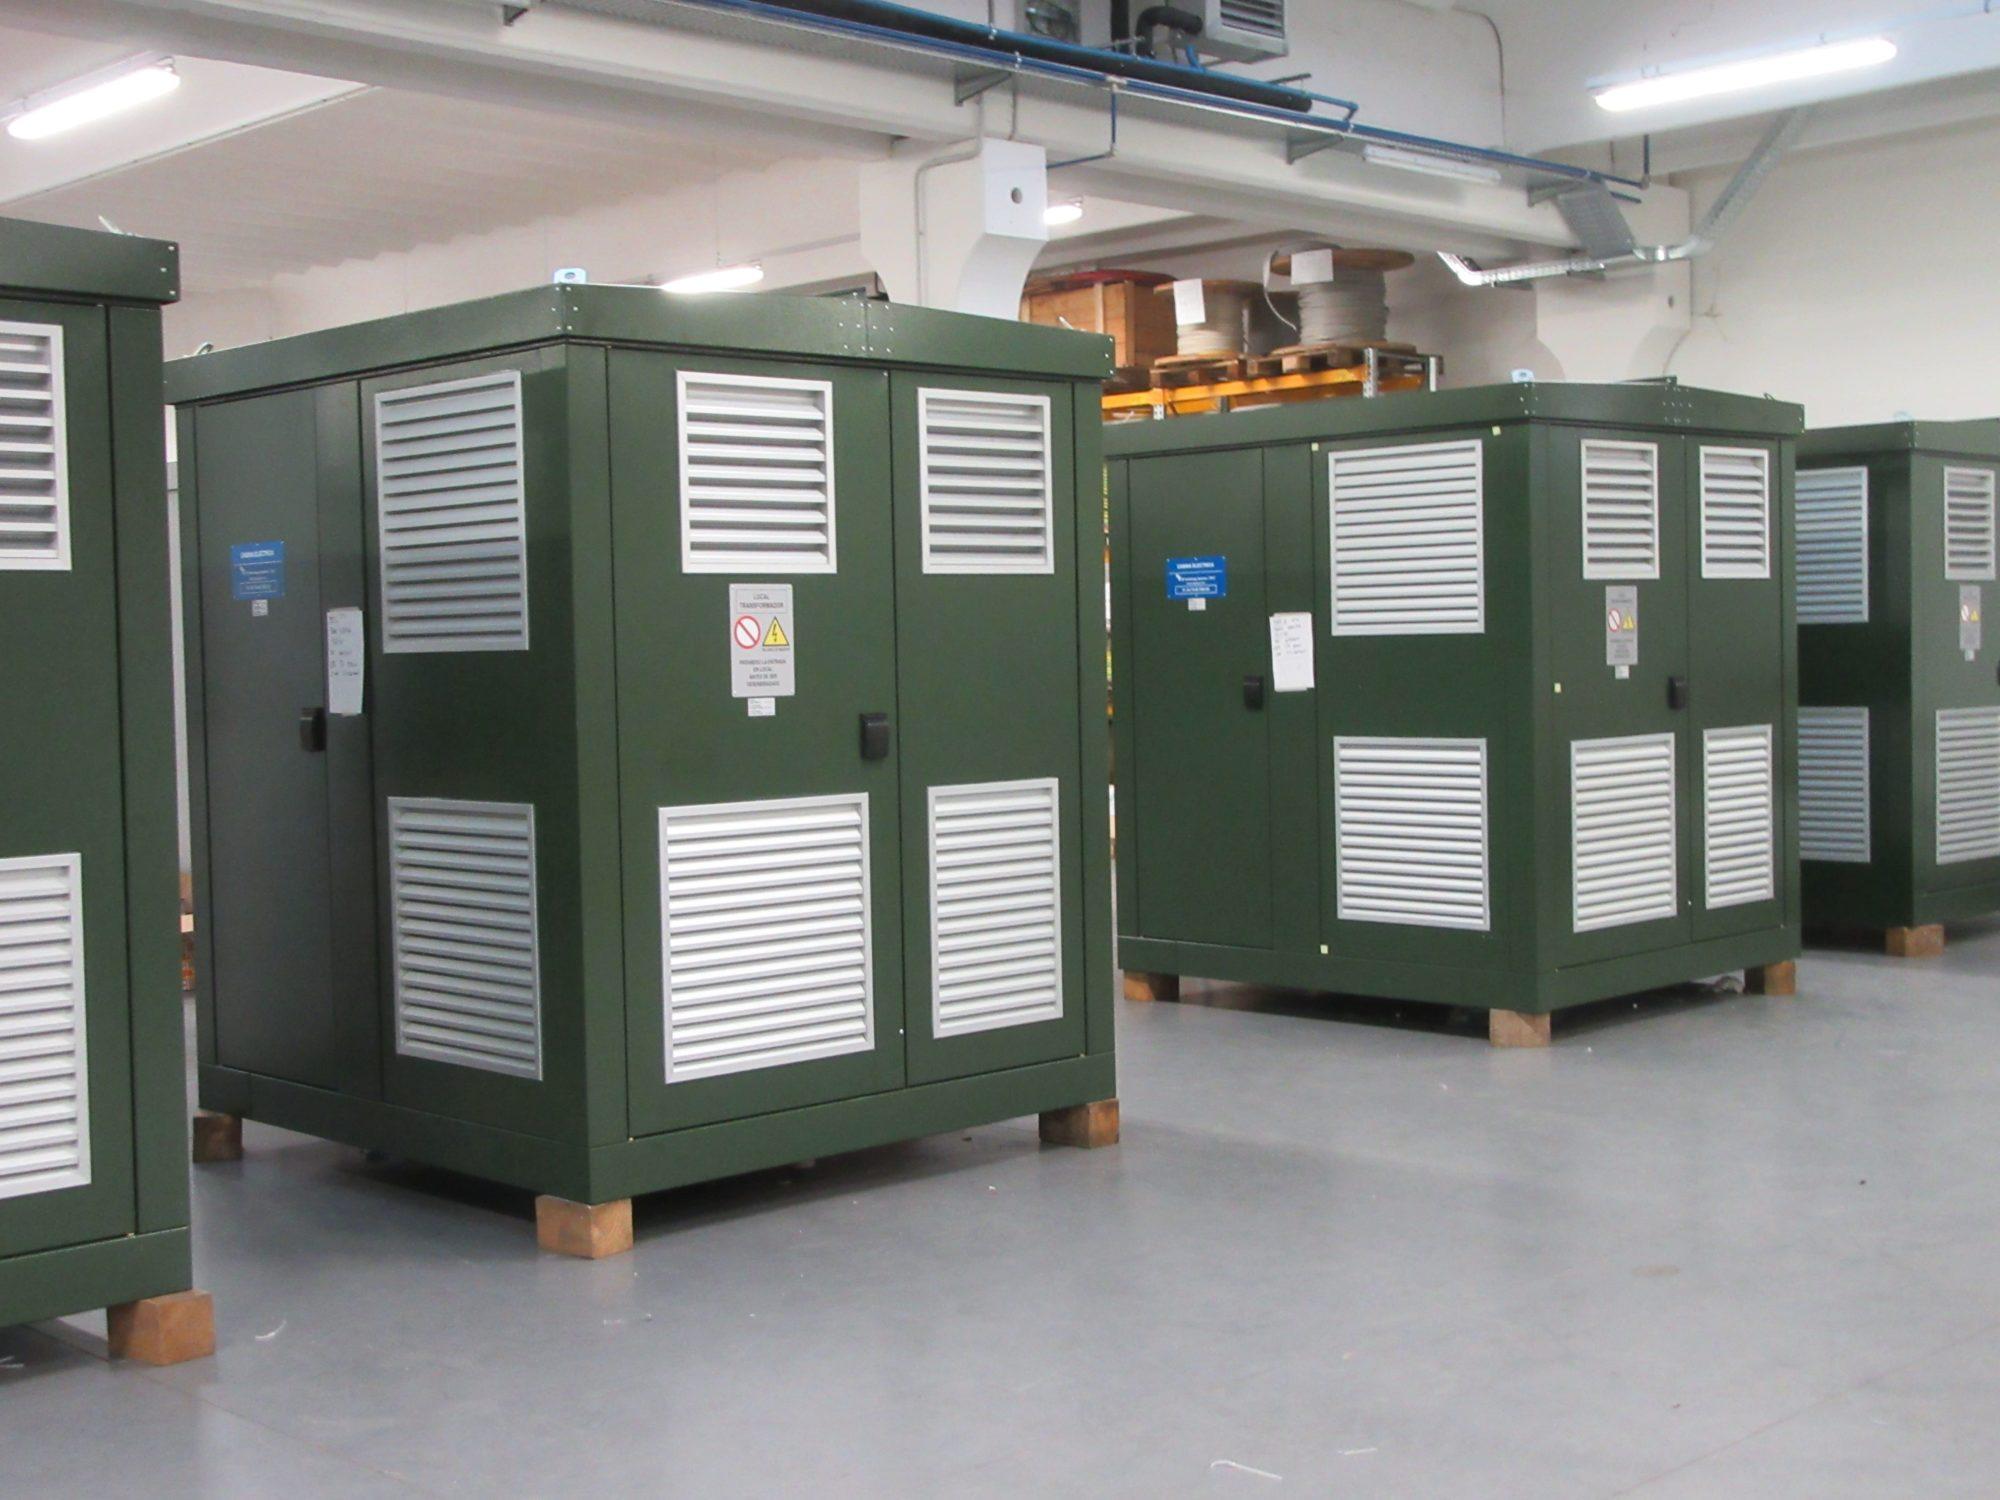 Modular compact substations